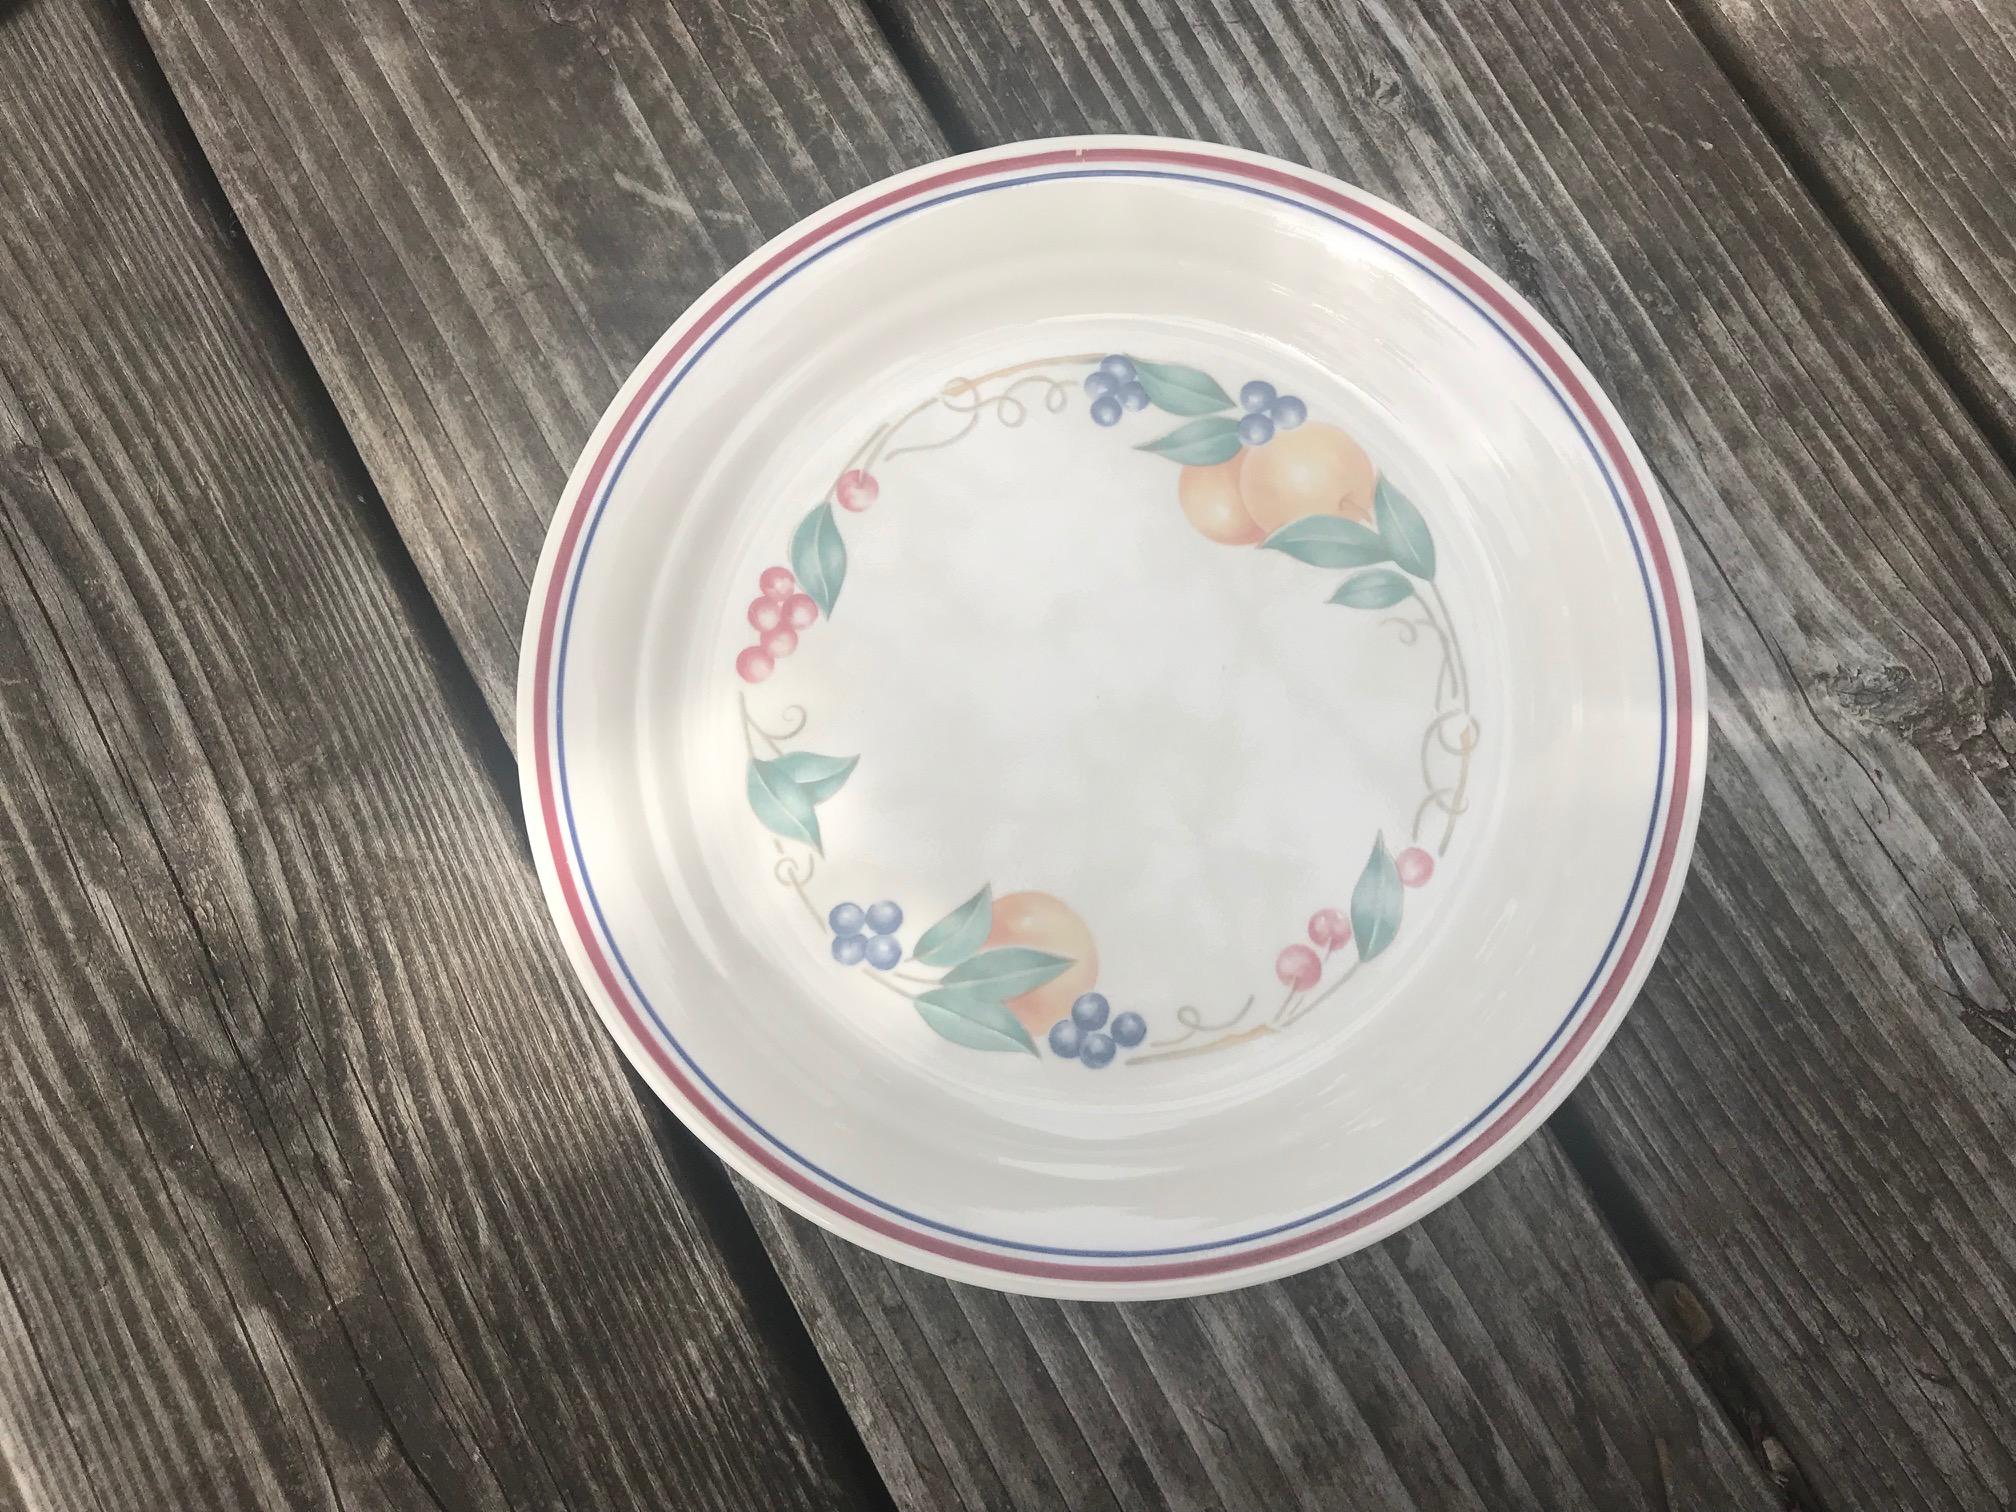 Vintage Corelle Cream Plate with Fruit Pattern: 14,900 +/- 400 ppm Lead & 327 +/- 20 ppm Cadmium